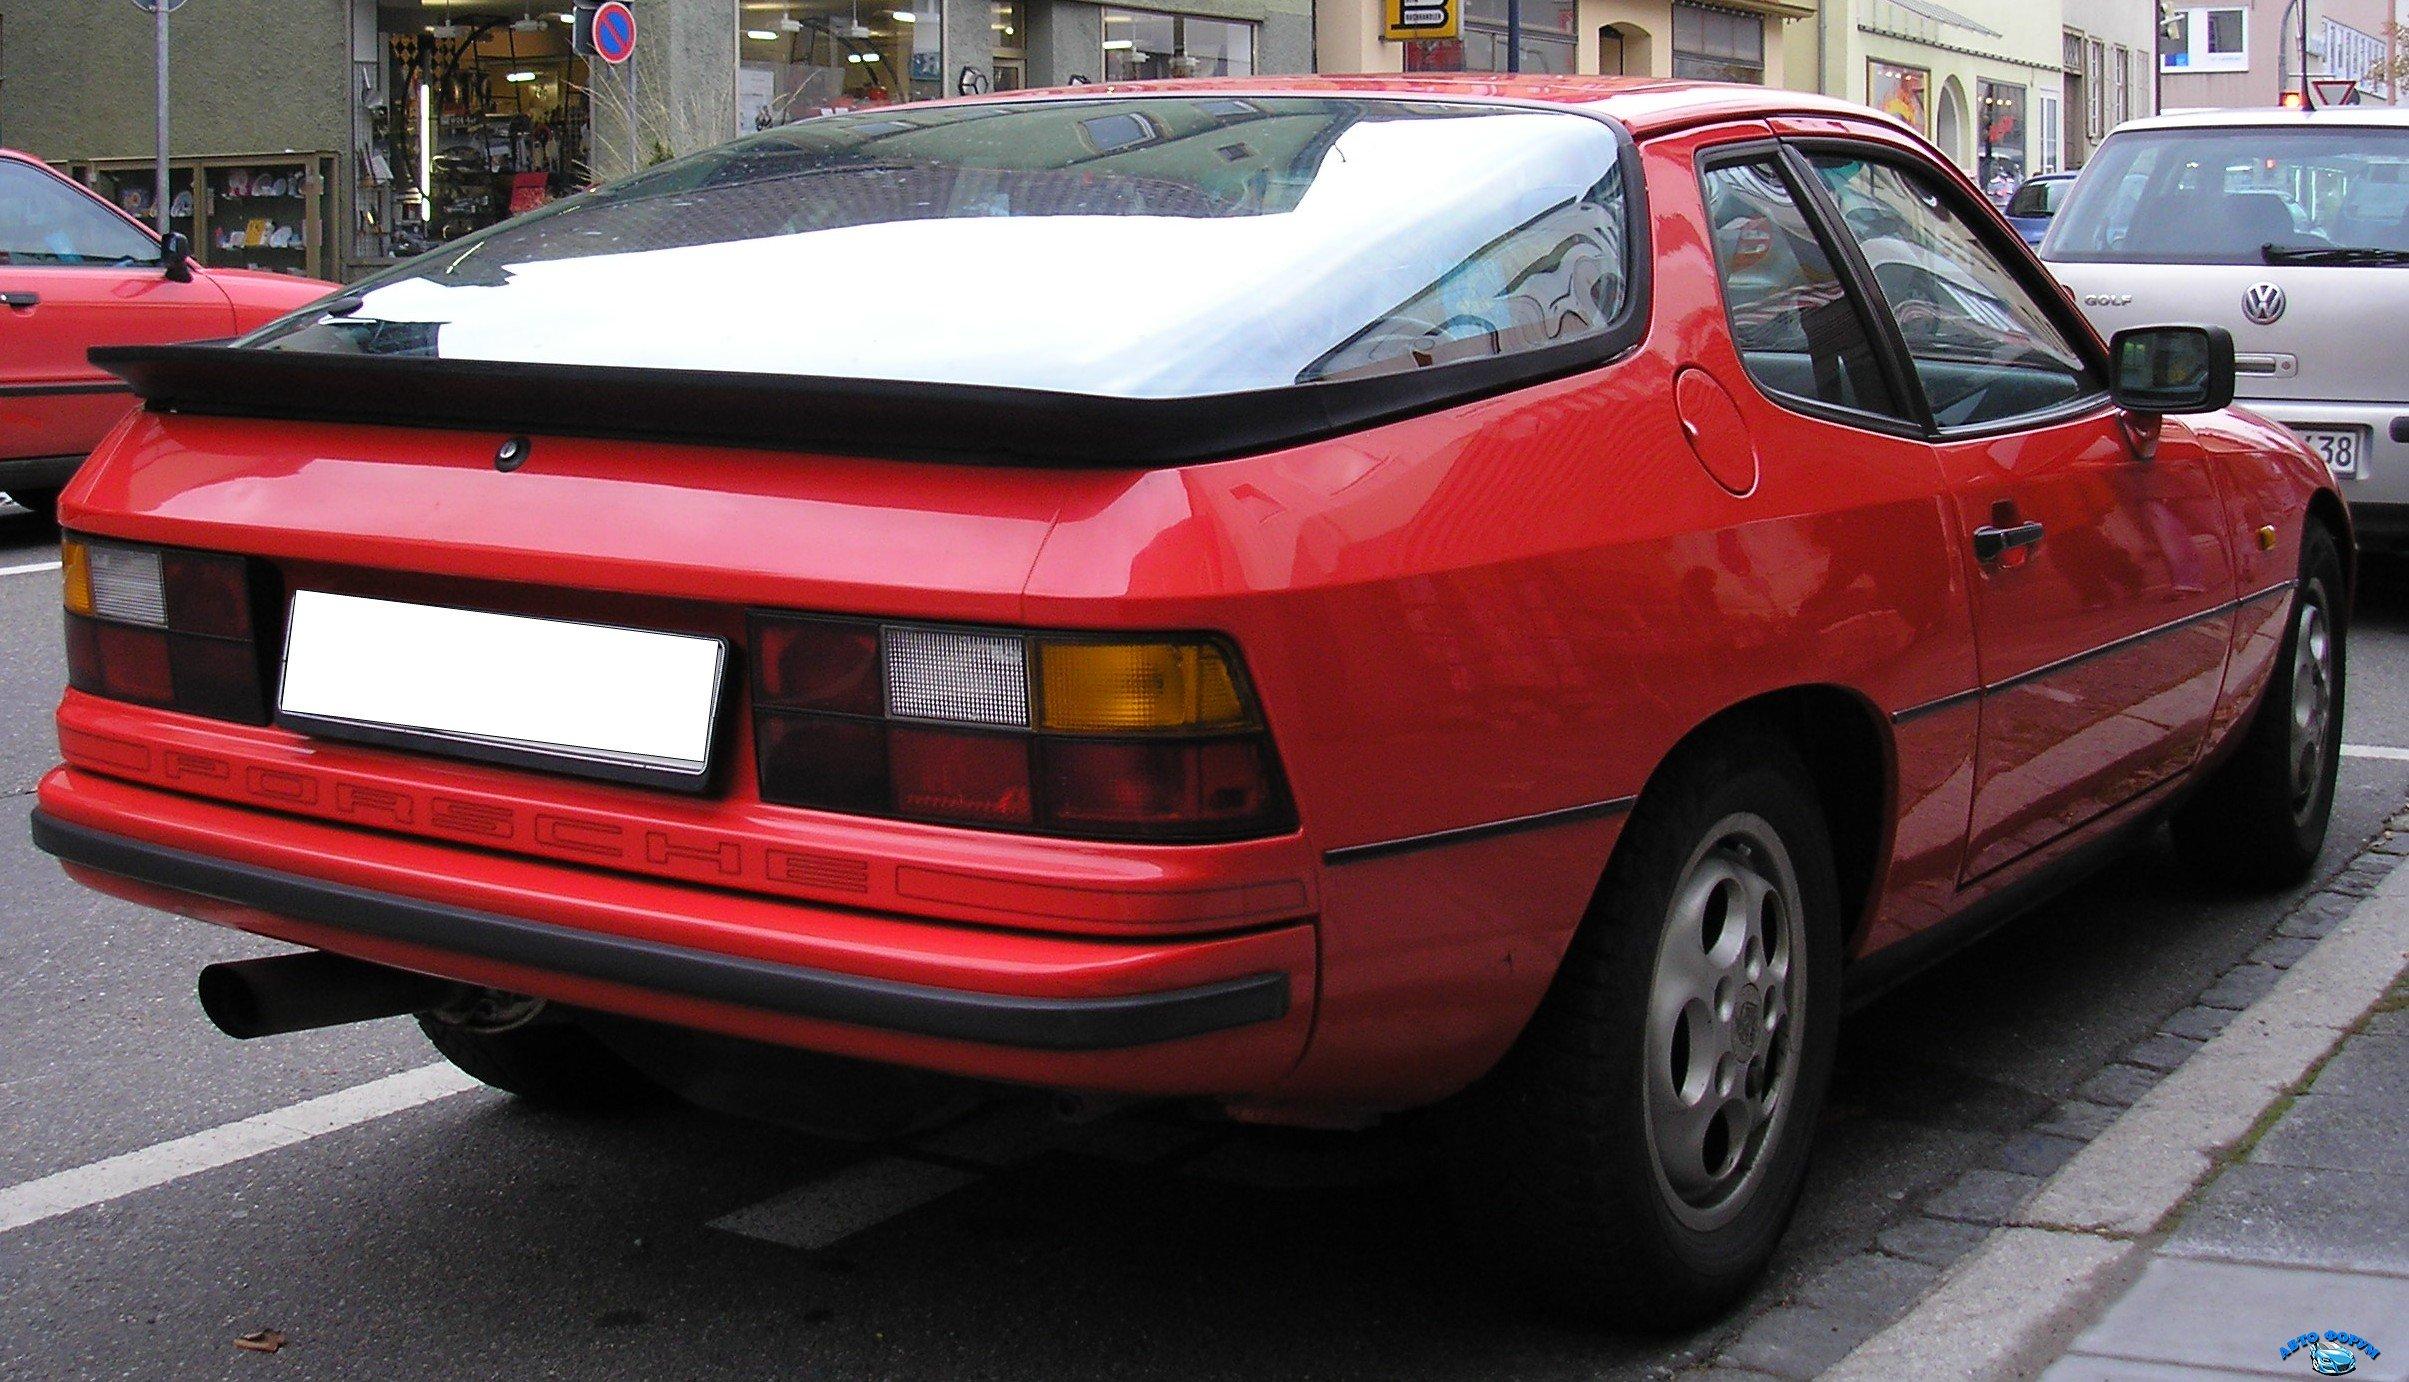 Porsche_924_rear1.jpg